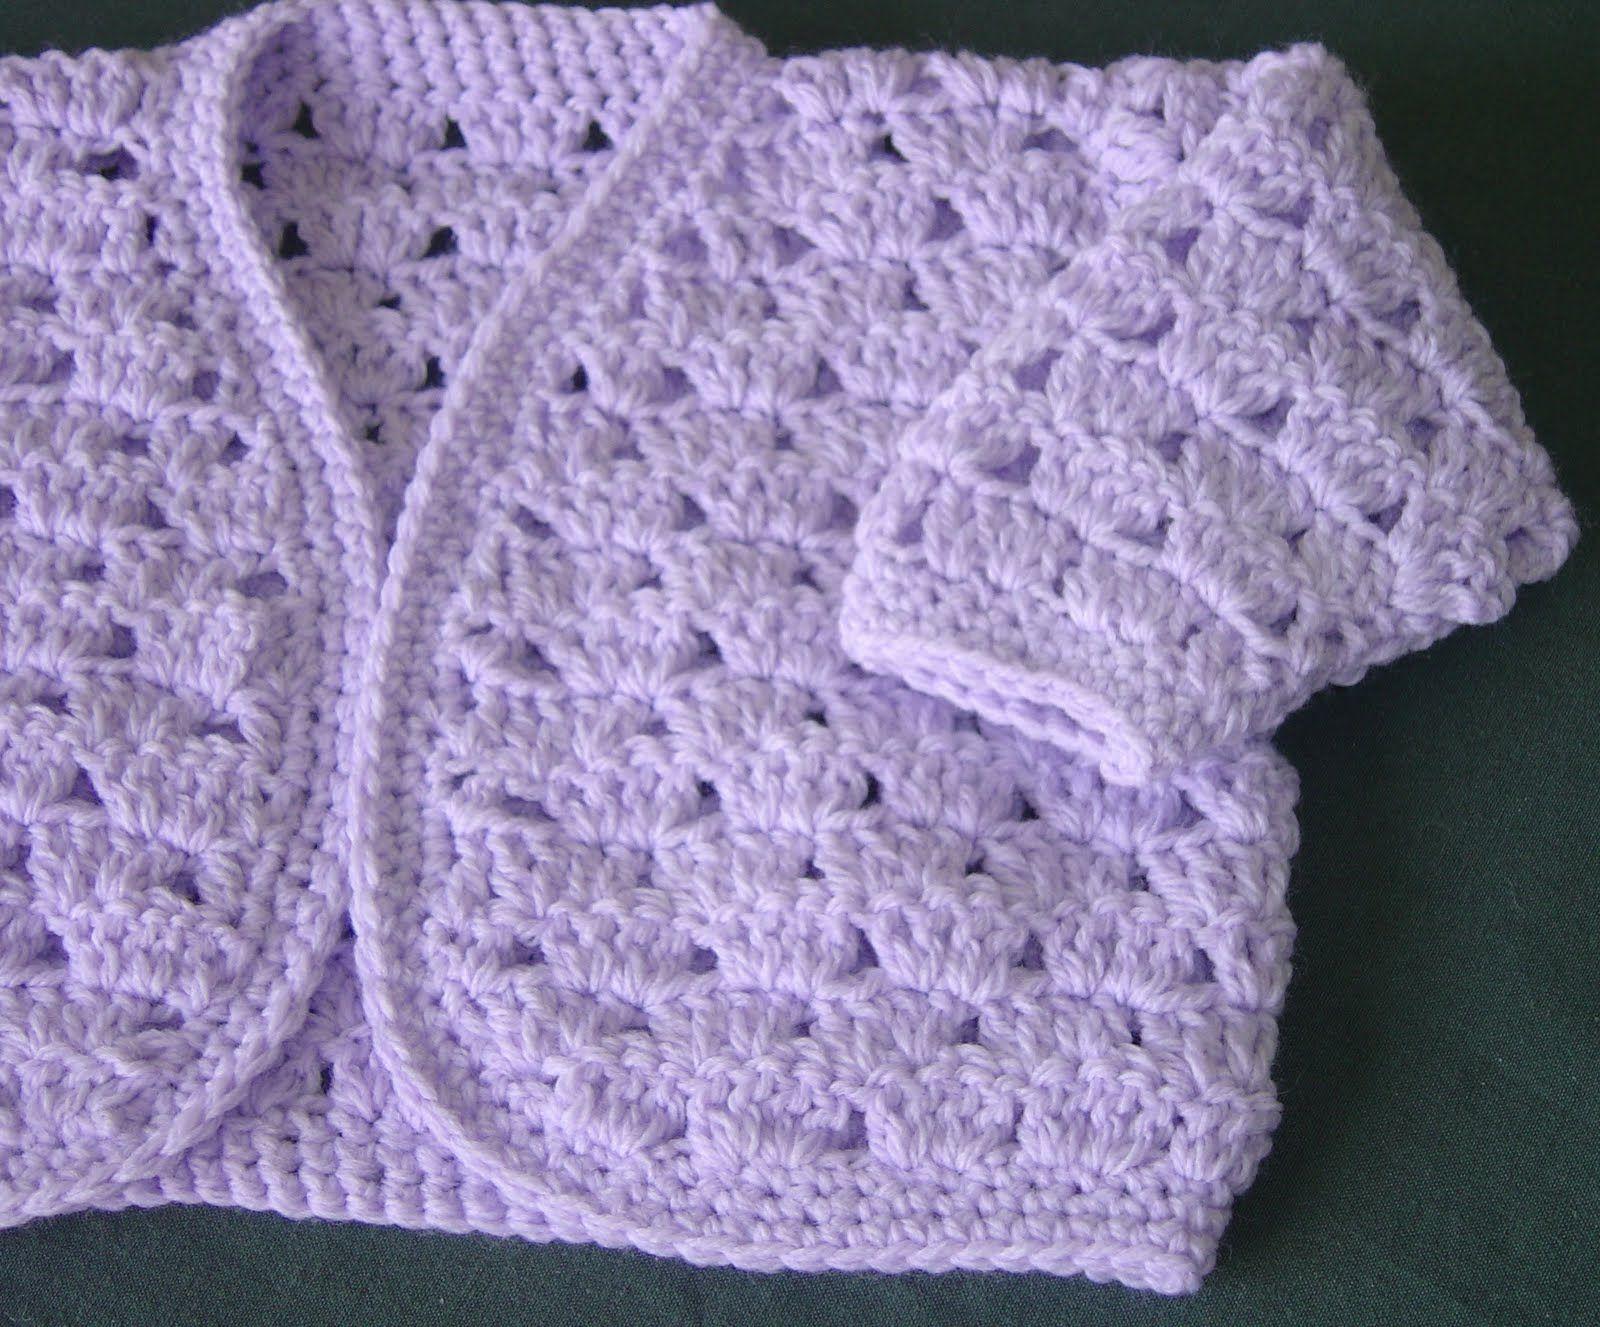 Free crochet pattern for baby bolero enthusiastic crochetoholic free crochet pattern for baby bolero enthusiastic crochetoholic crochet baby bolero bankloansurffo Choice Image